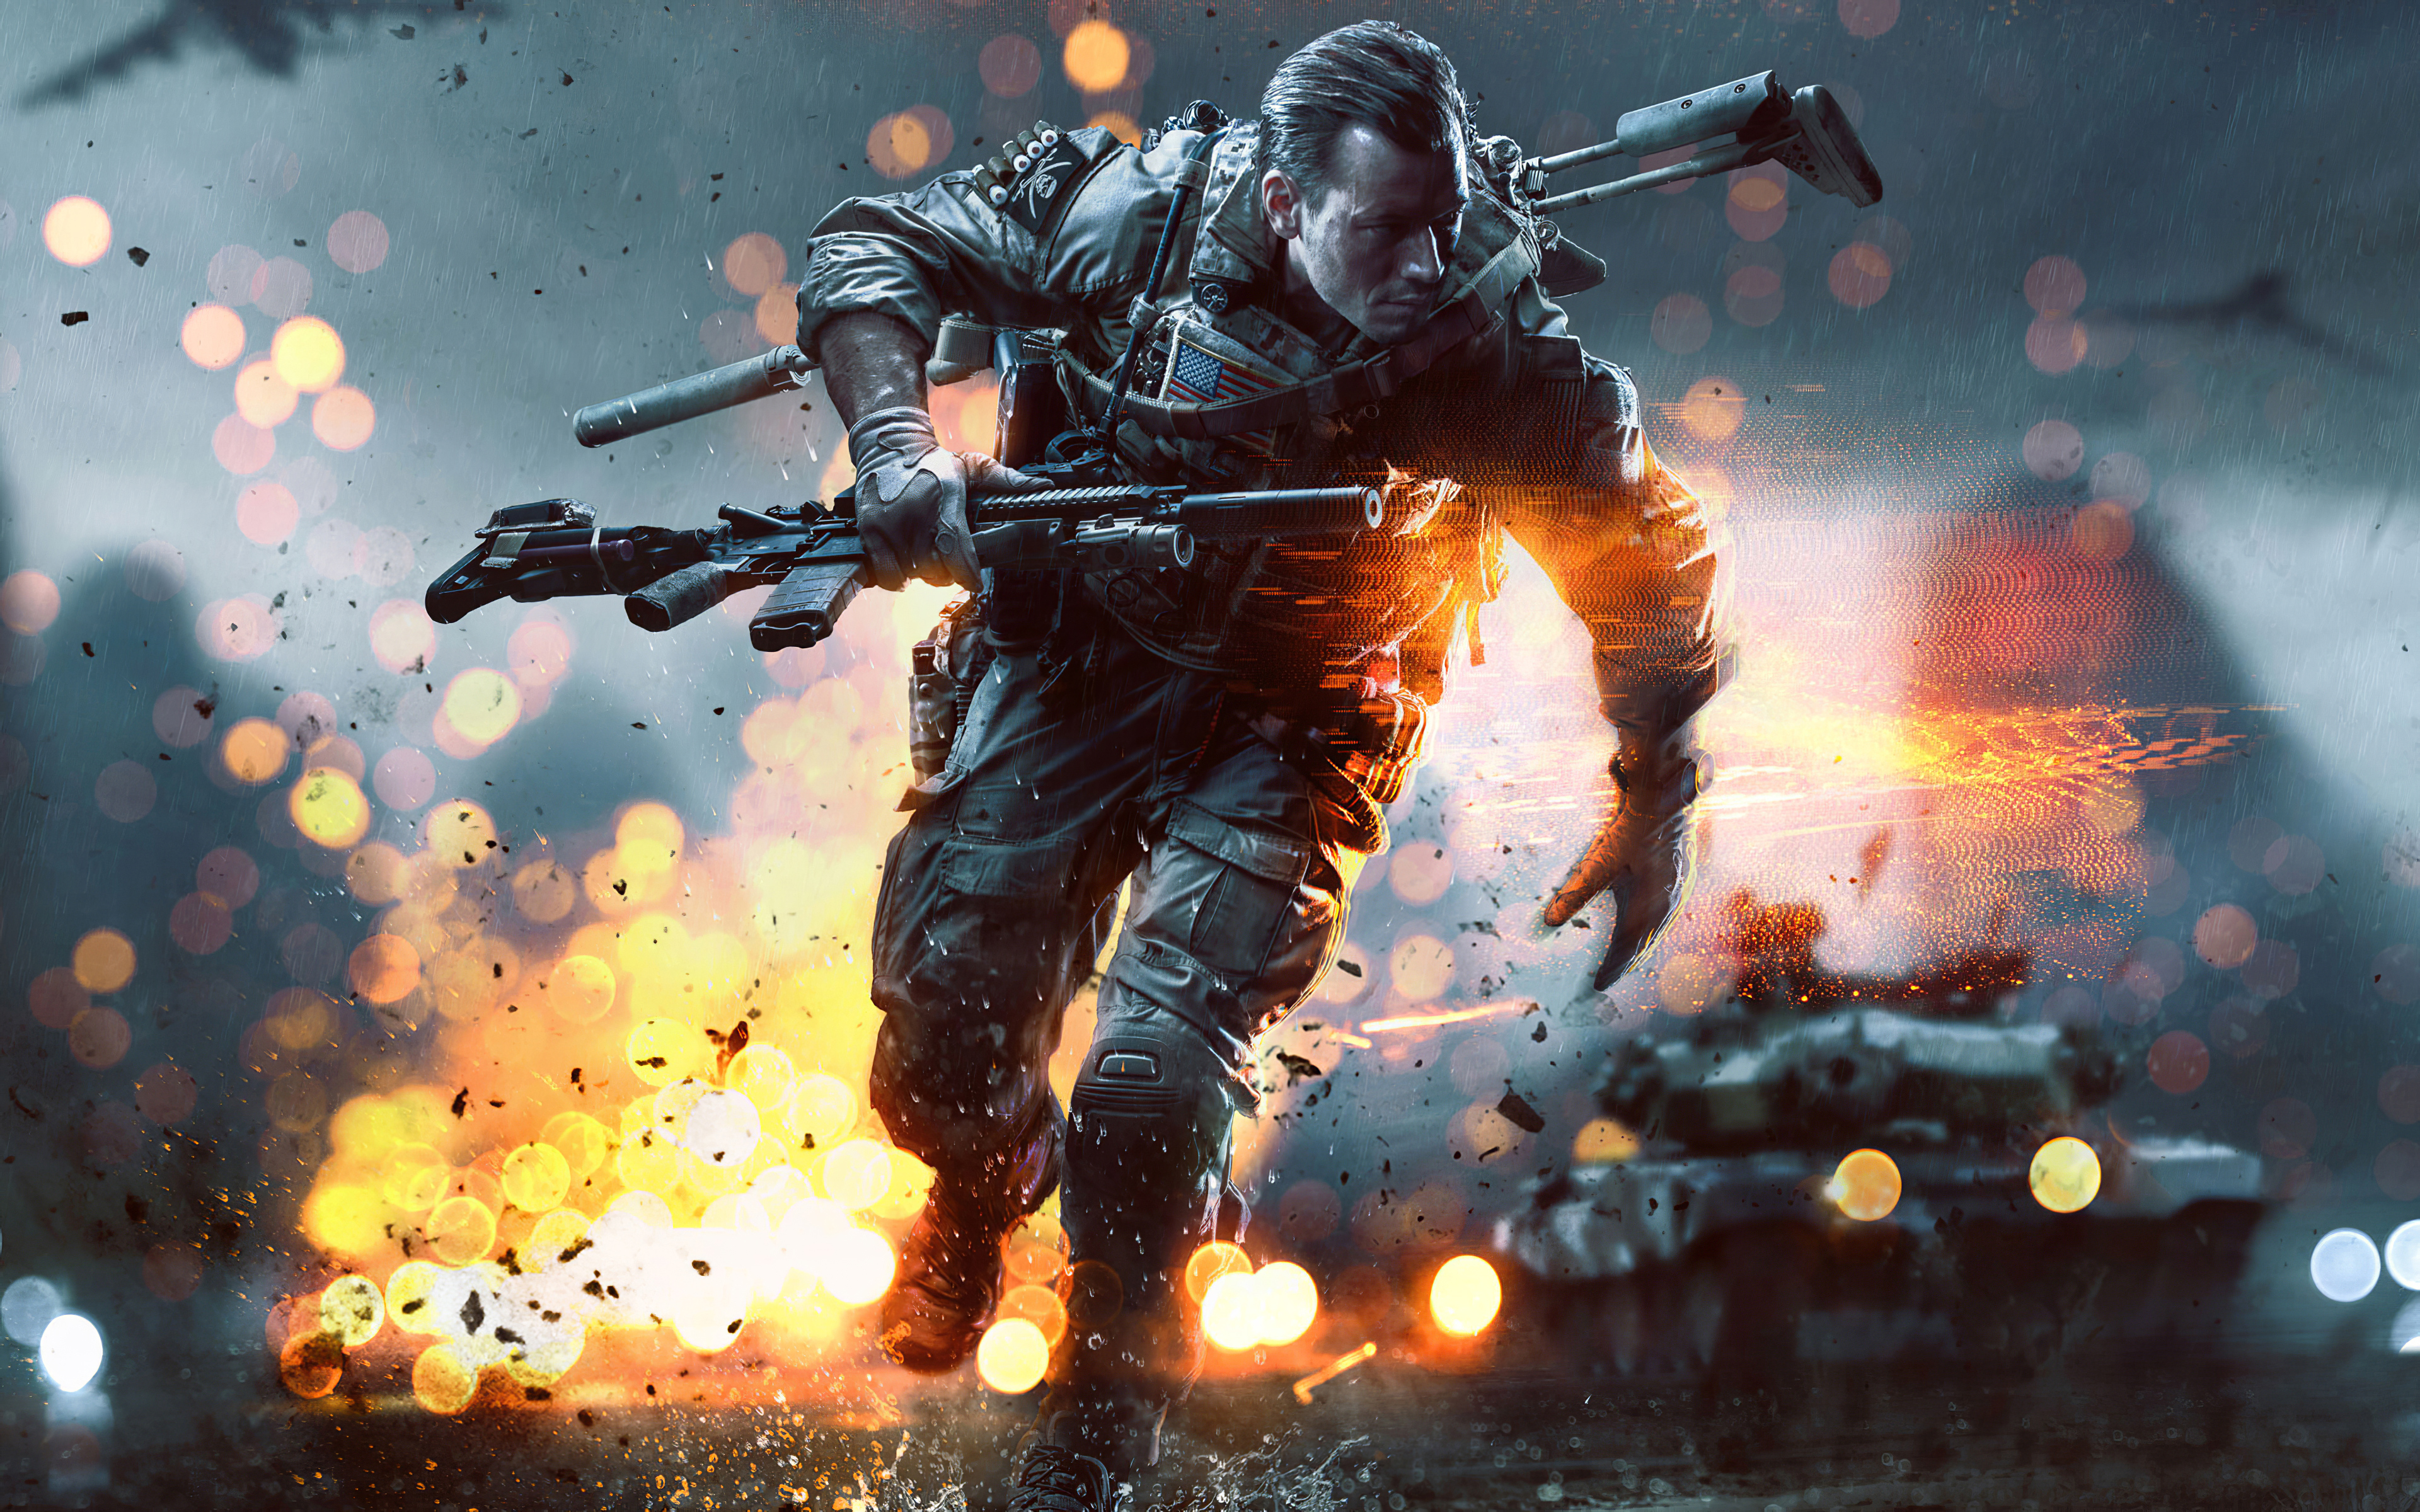 battlefield 4 1578854952 - Battlefield 4 - Battlefield 4 game wallpapers, 2019 Battlefield 4 wallpapers 4k, 2019 Battlefield 4 wallpaper ultra hd